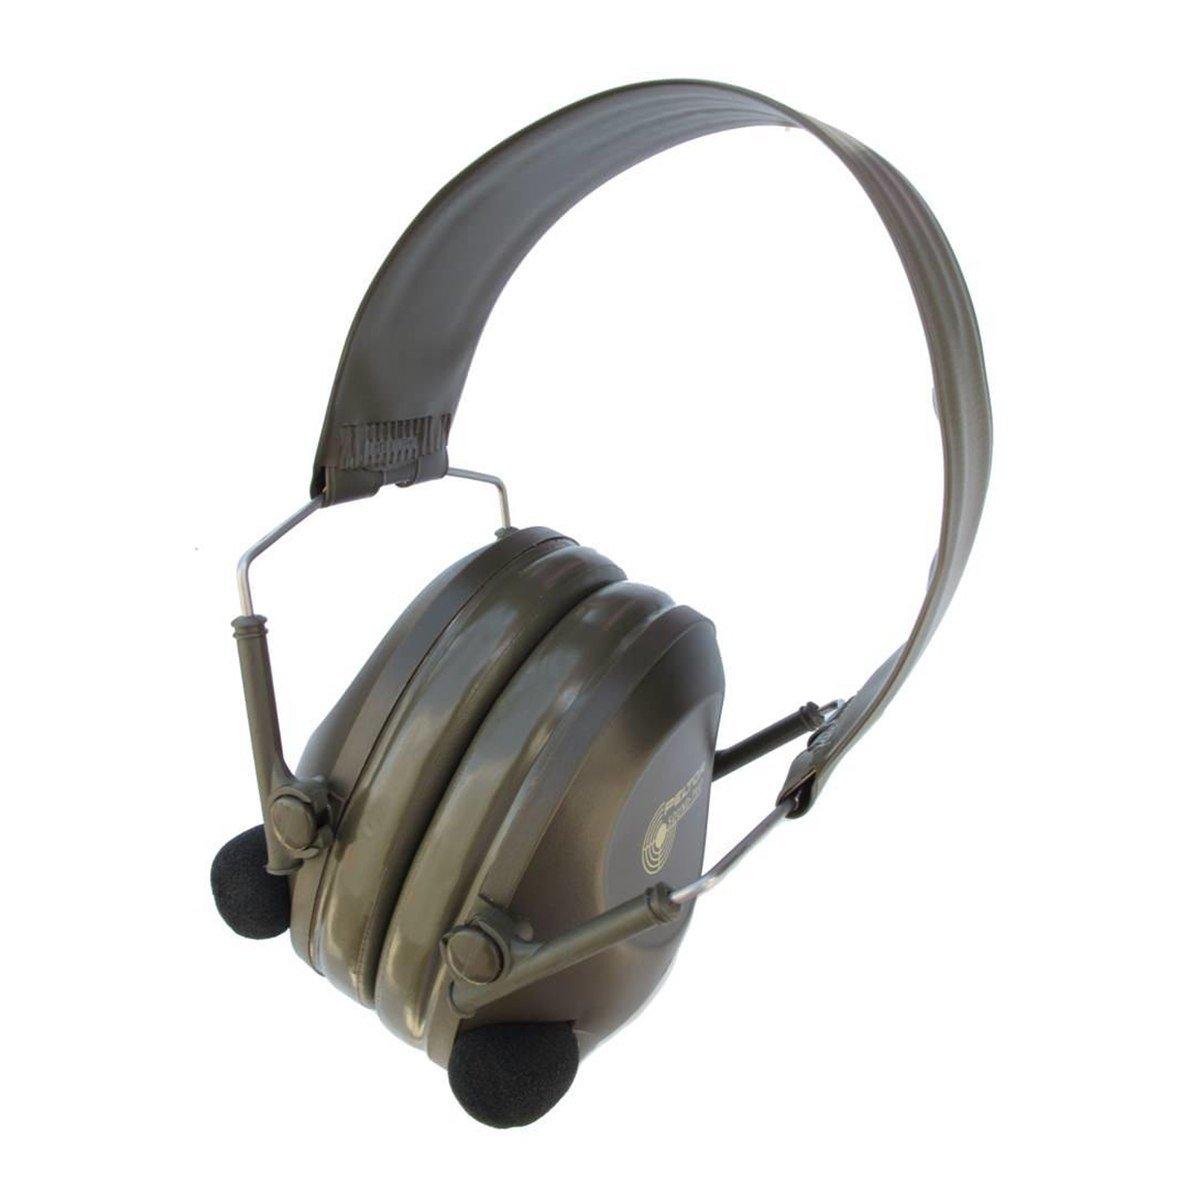 3M Peltor Sound-Trap MT15H67FB Green Over Head Foam Protective Earmuffs - 20 dB NRR - 318640-00240 [PRICE is per CASE]